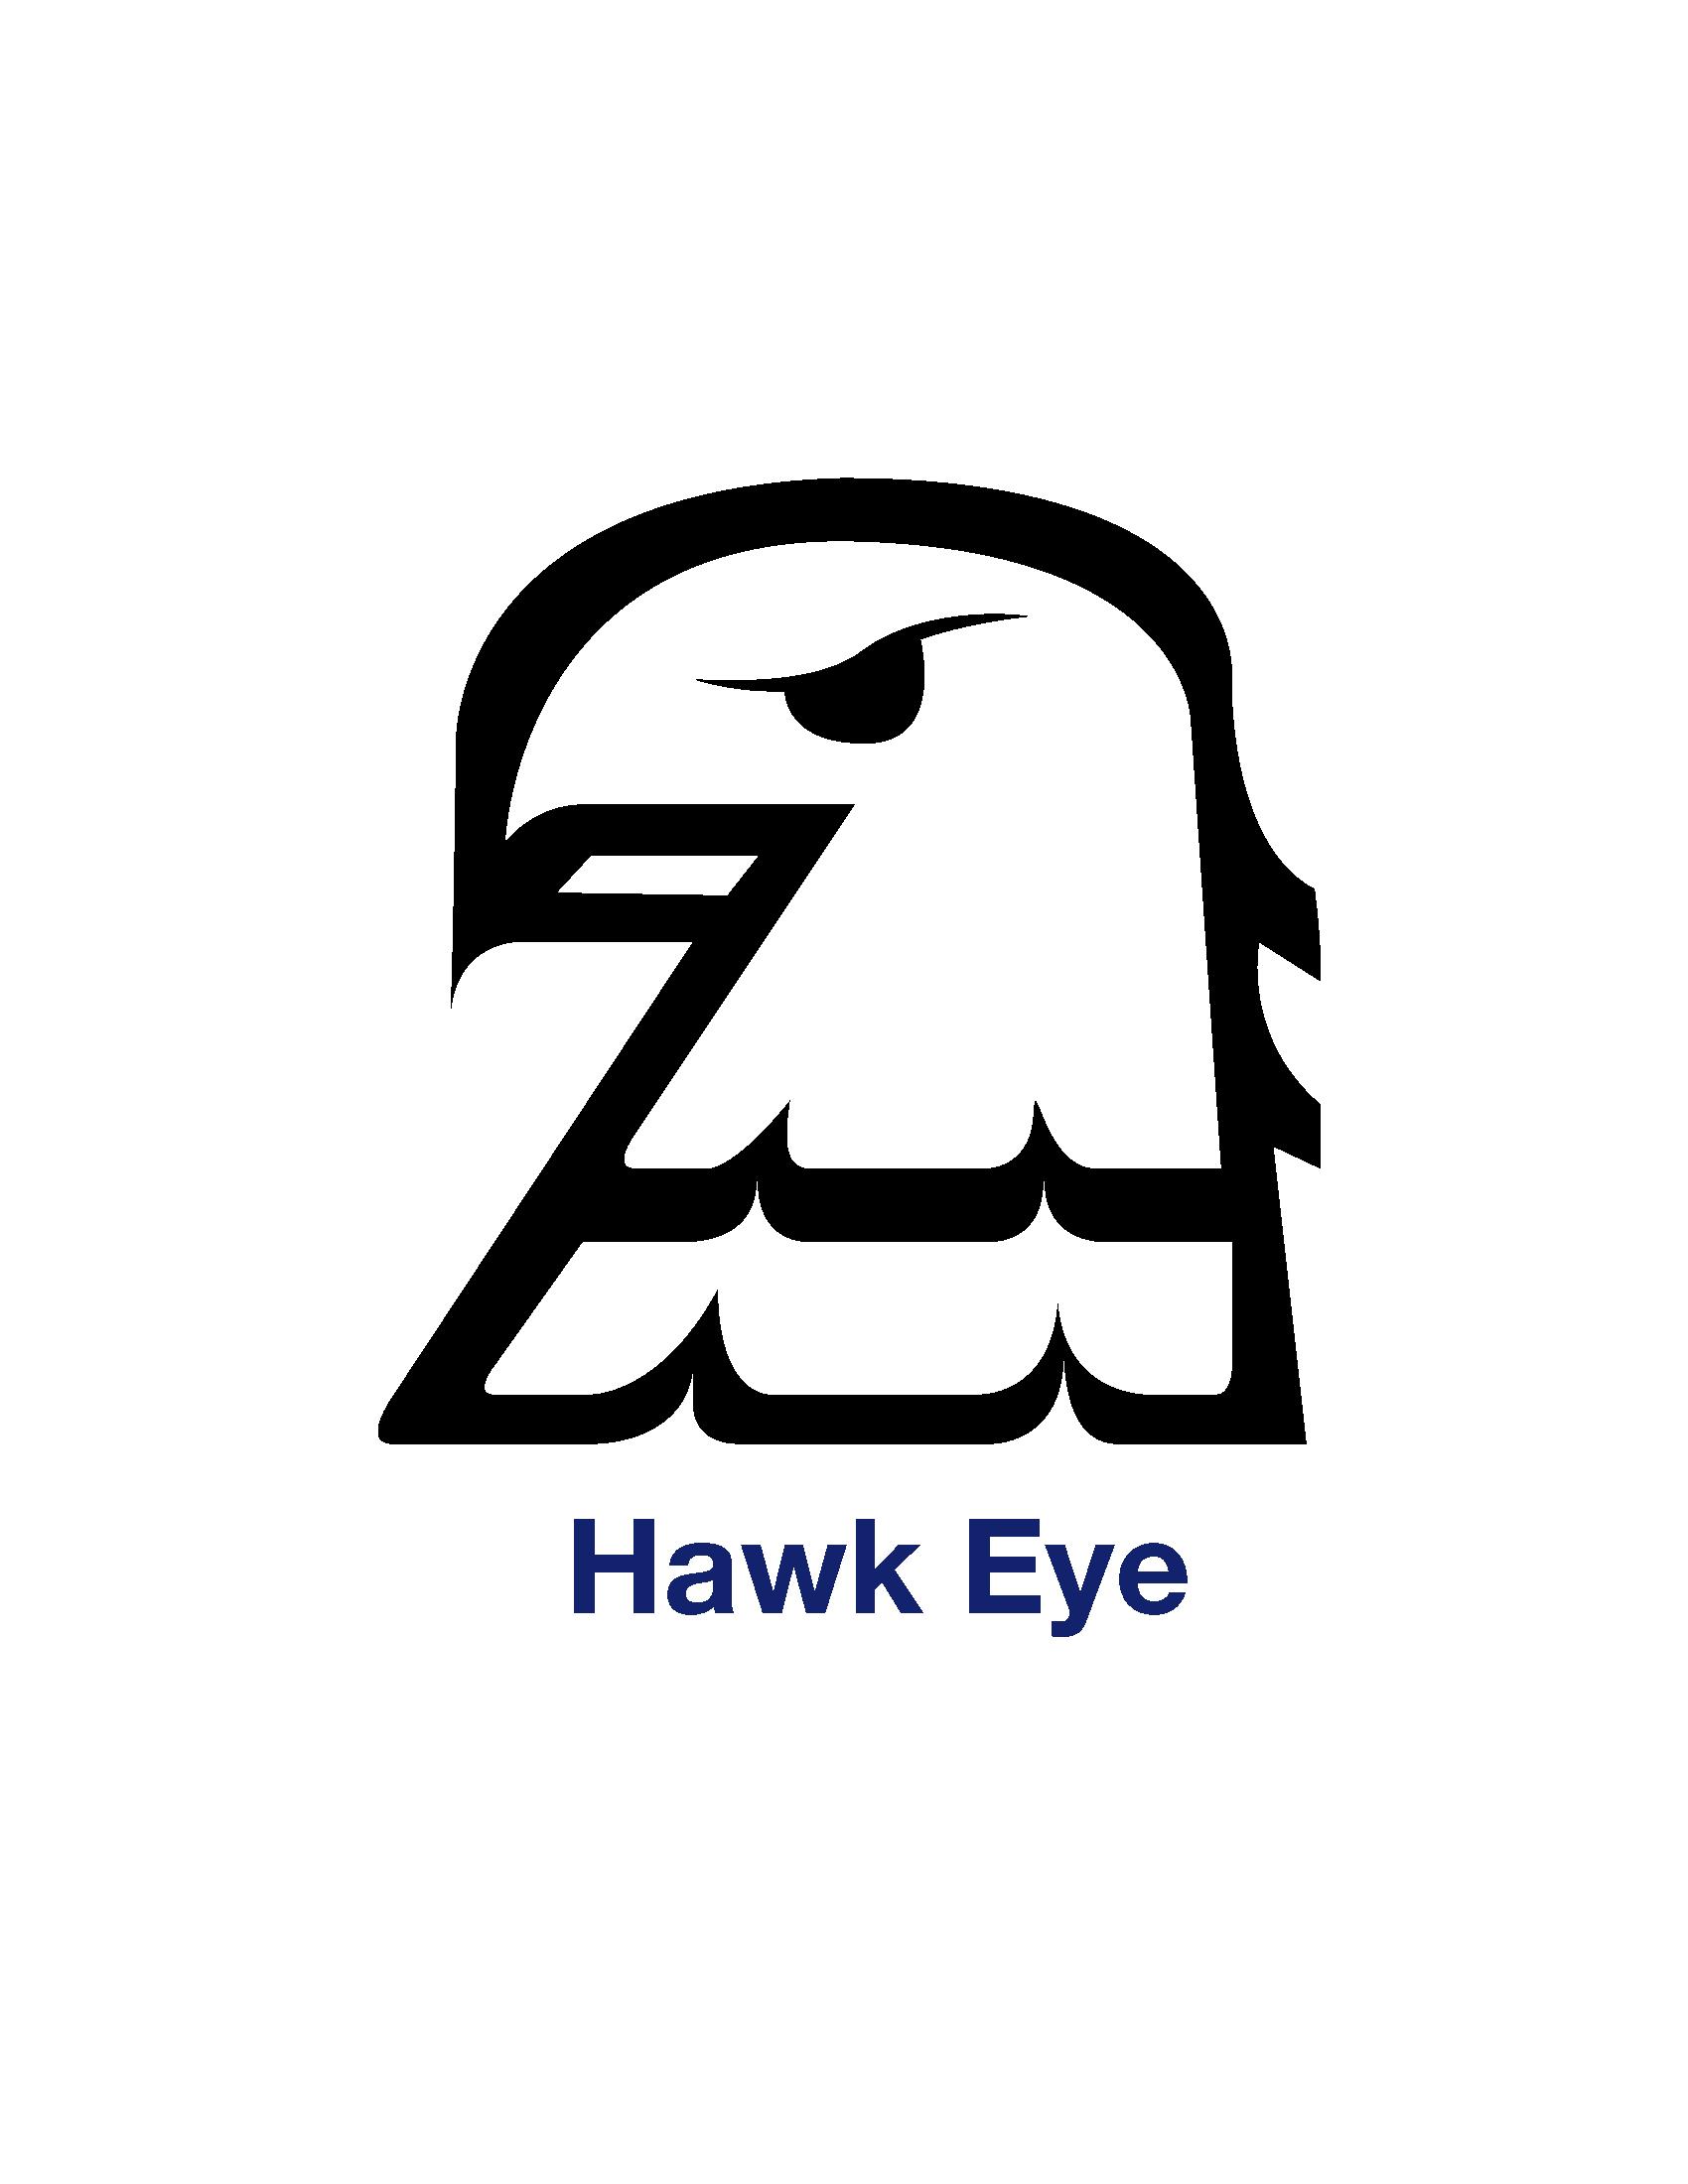 Hawk Eye Protech Systems